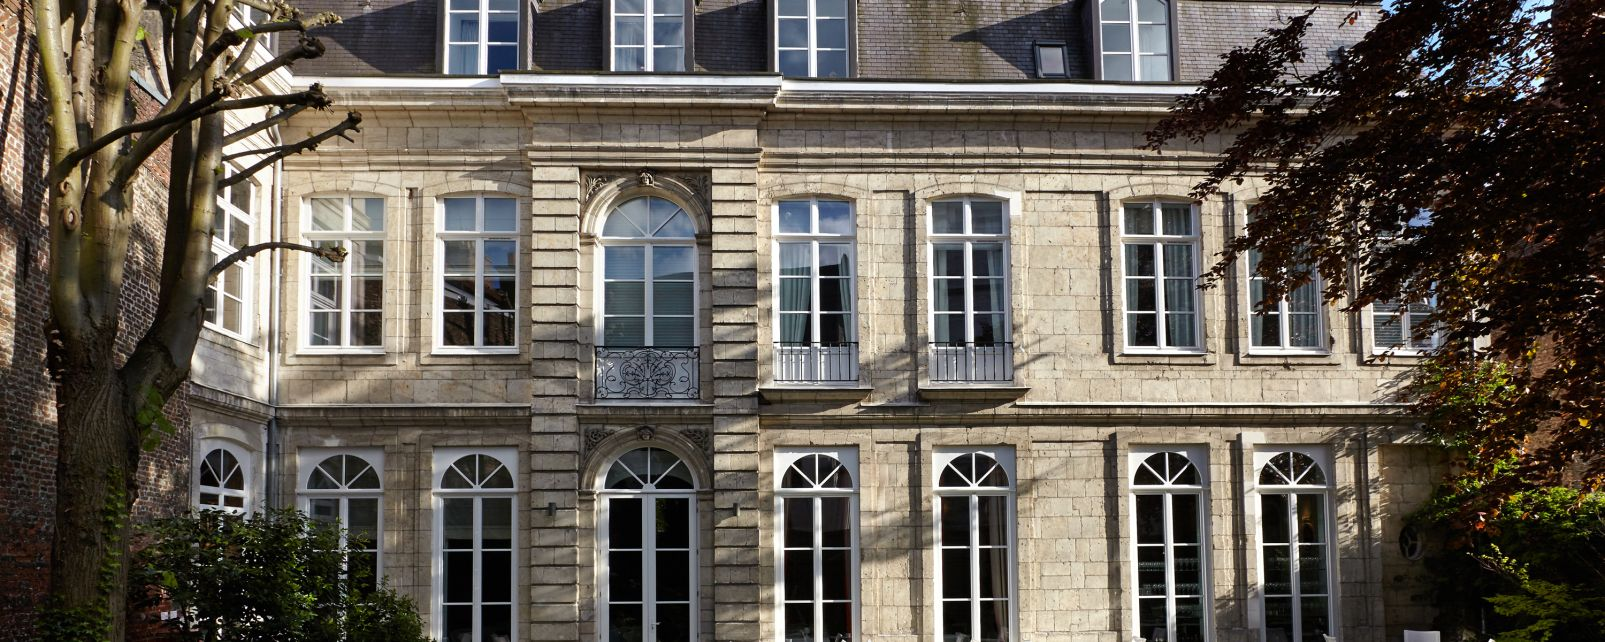 Hôtel Clarance Lille, Lille